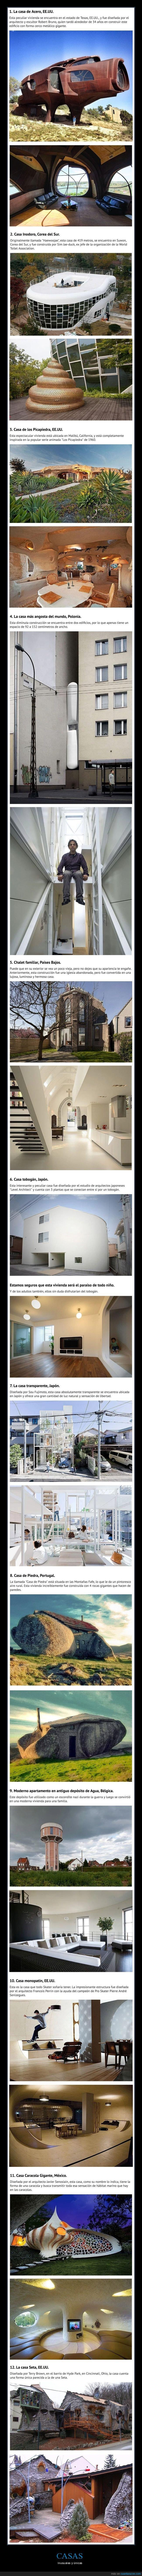 arquitectura,casas,raras